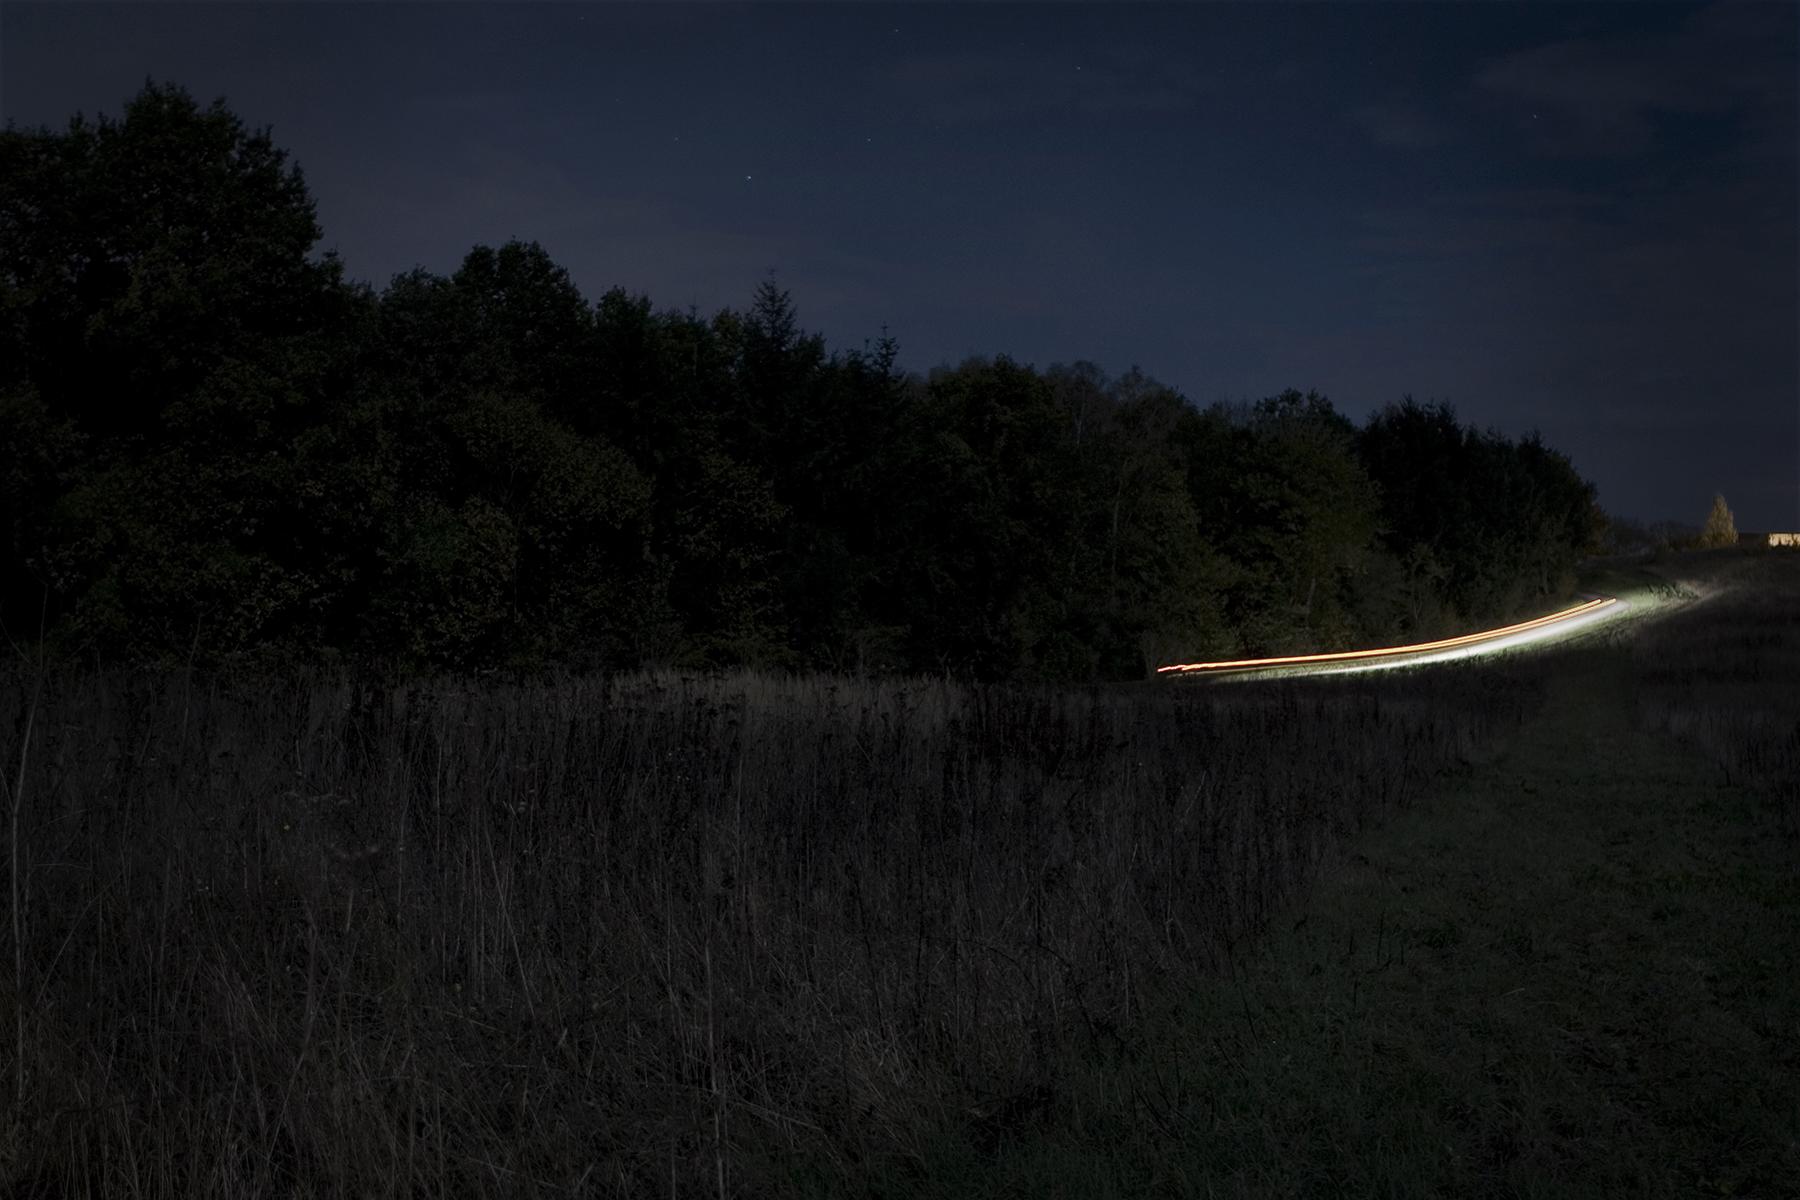 paysage_nuit03 copy.jpg